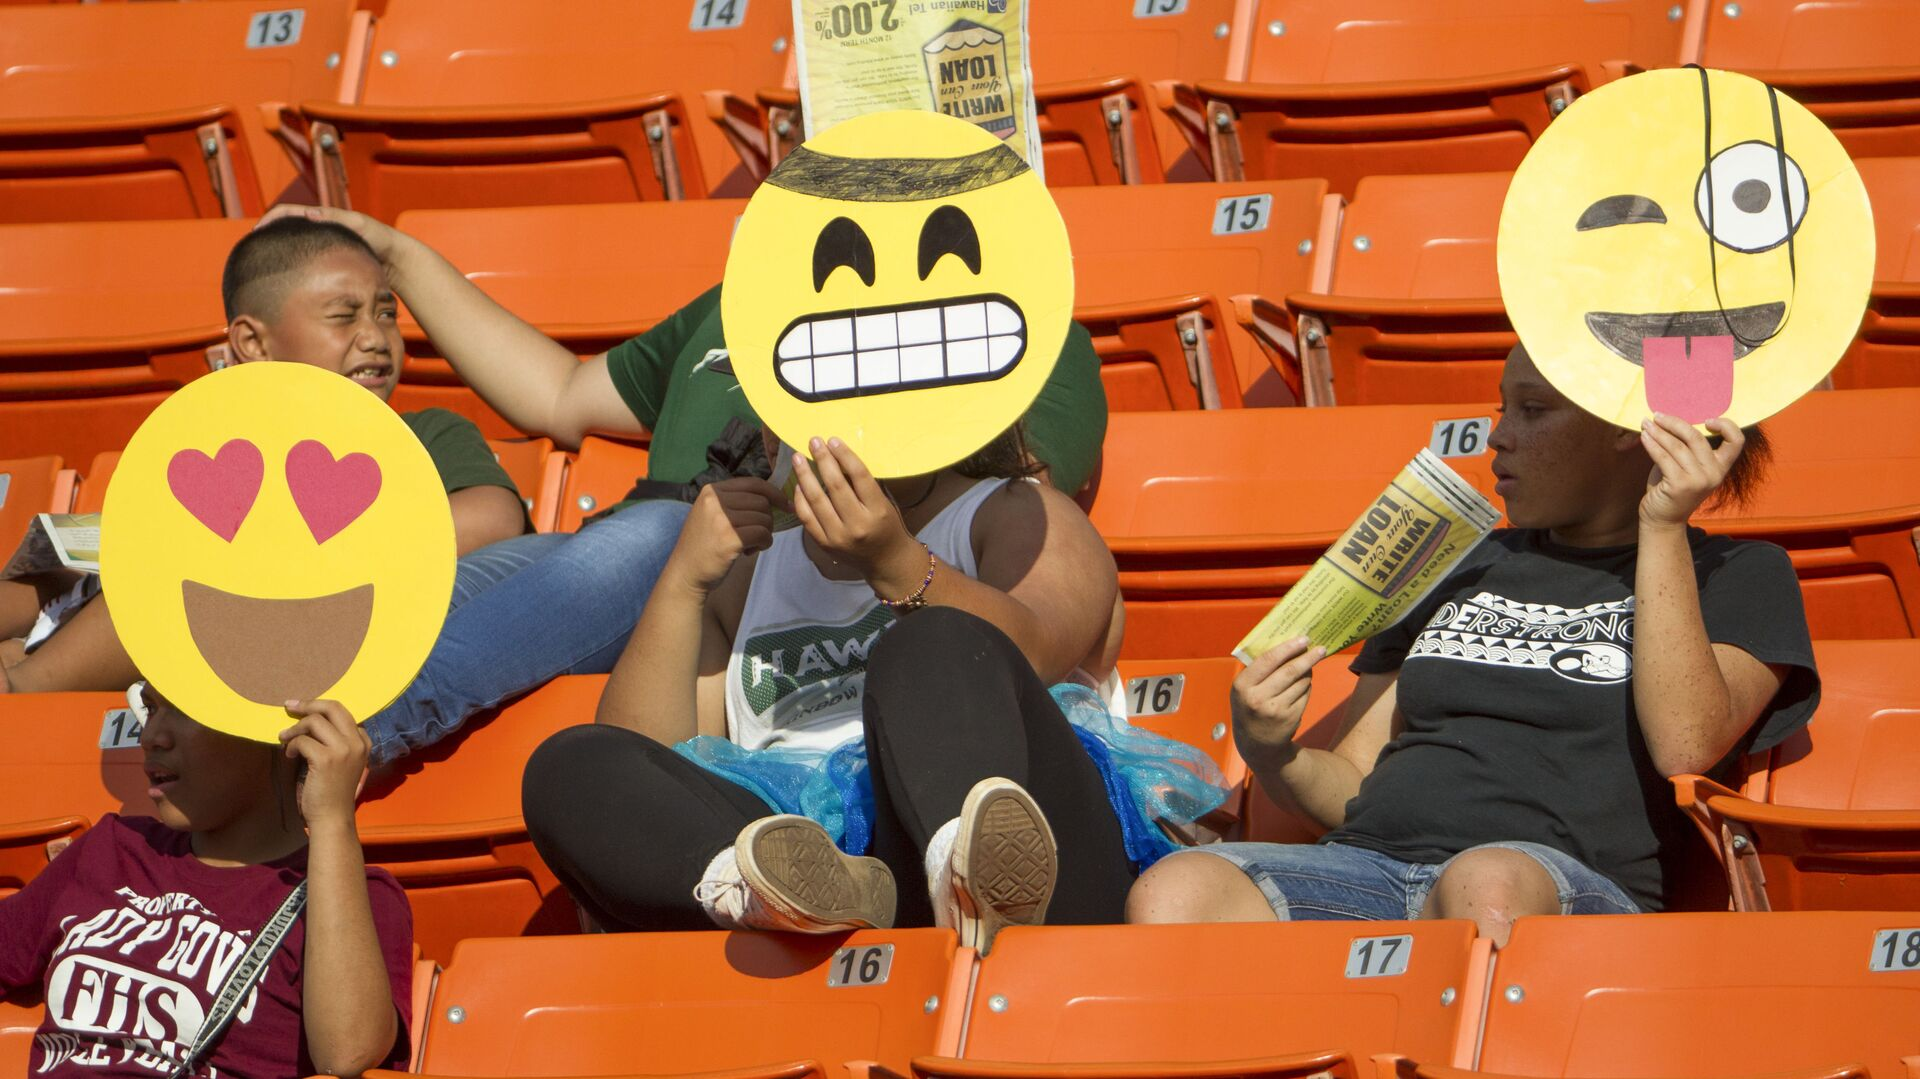 Tifosi con emoji sugli spalti a Honolulu - Sputnik Italia, 1920, 05.08.2021